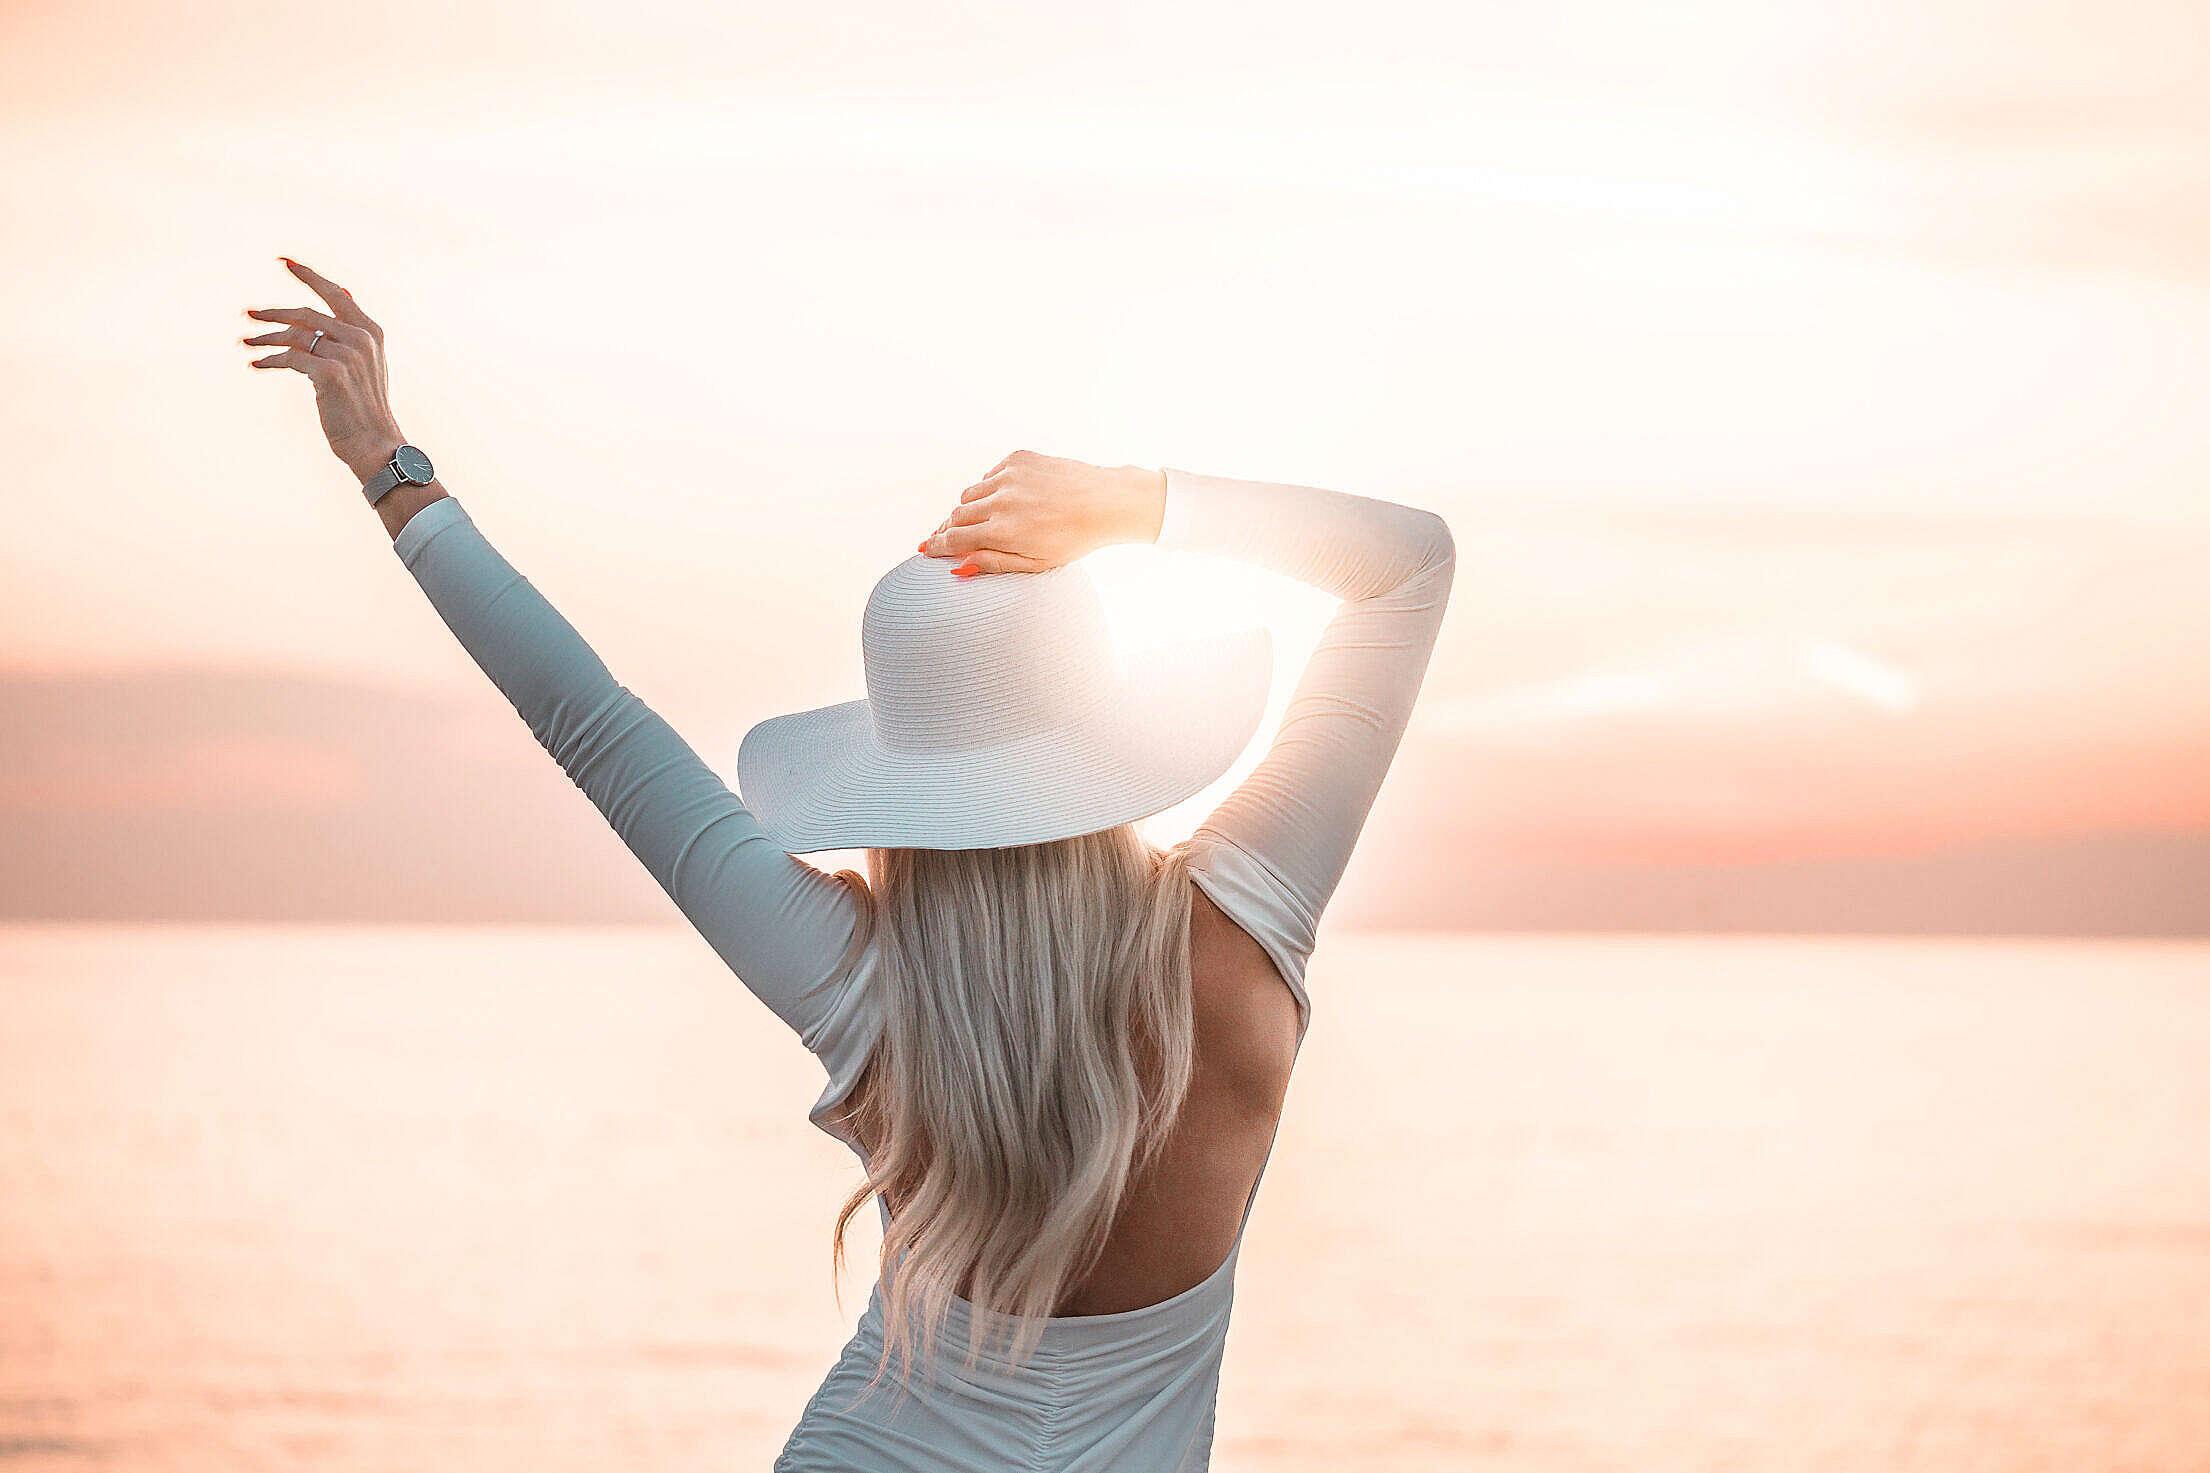 Woman Enjoying the Sunset by the Sea Free Stock Photo